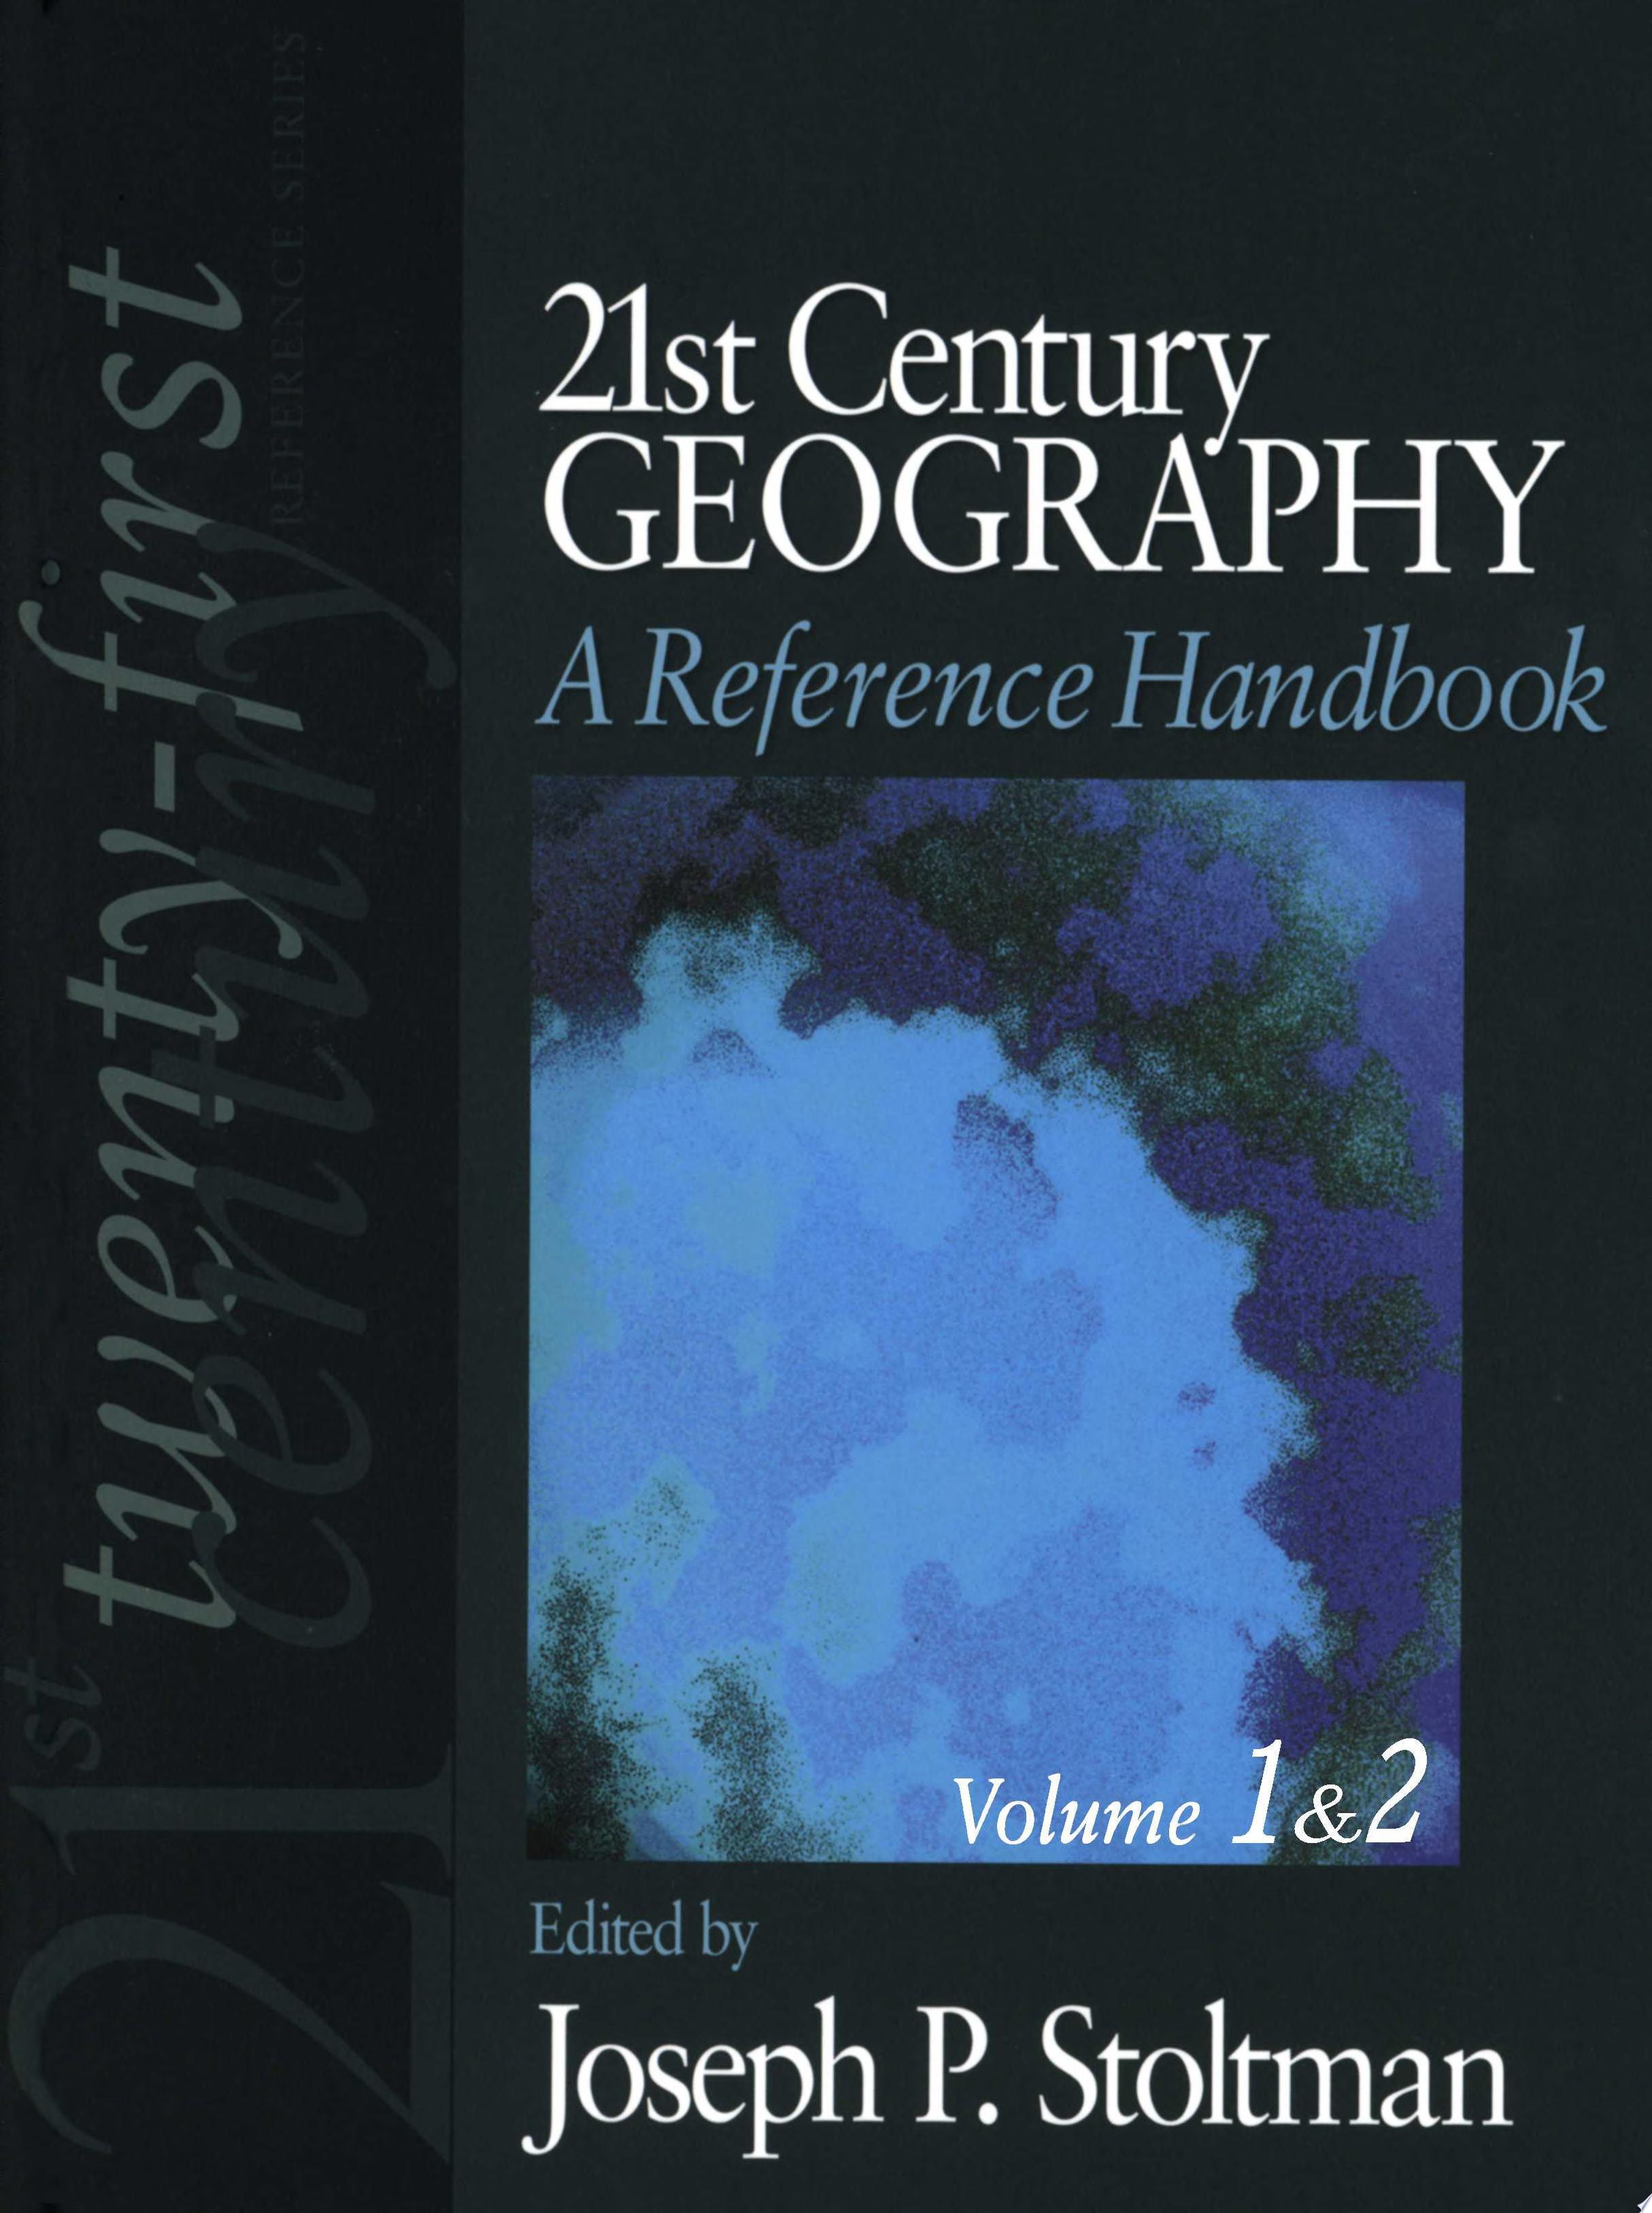 21st Century Geography